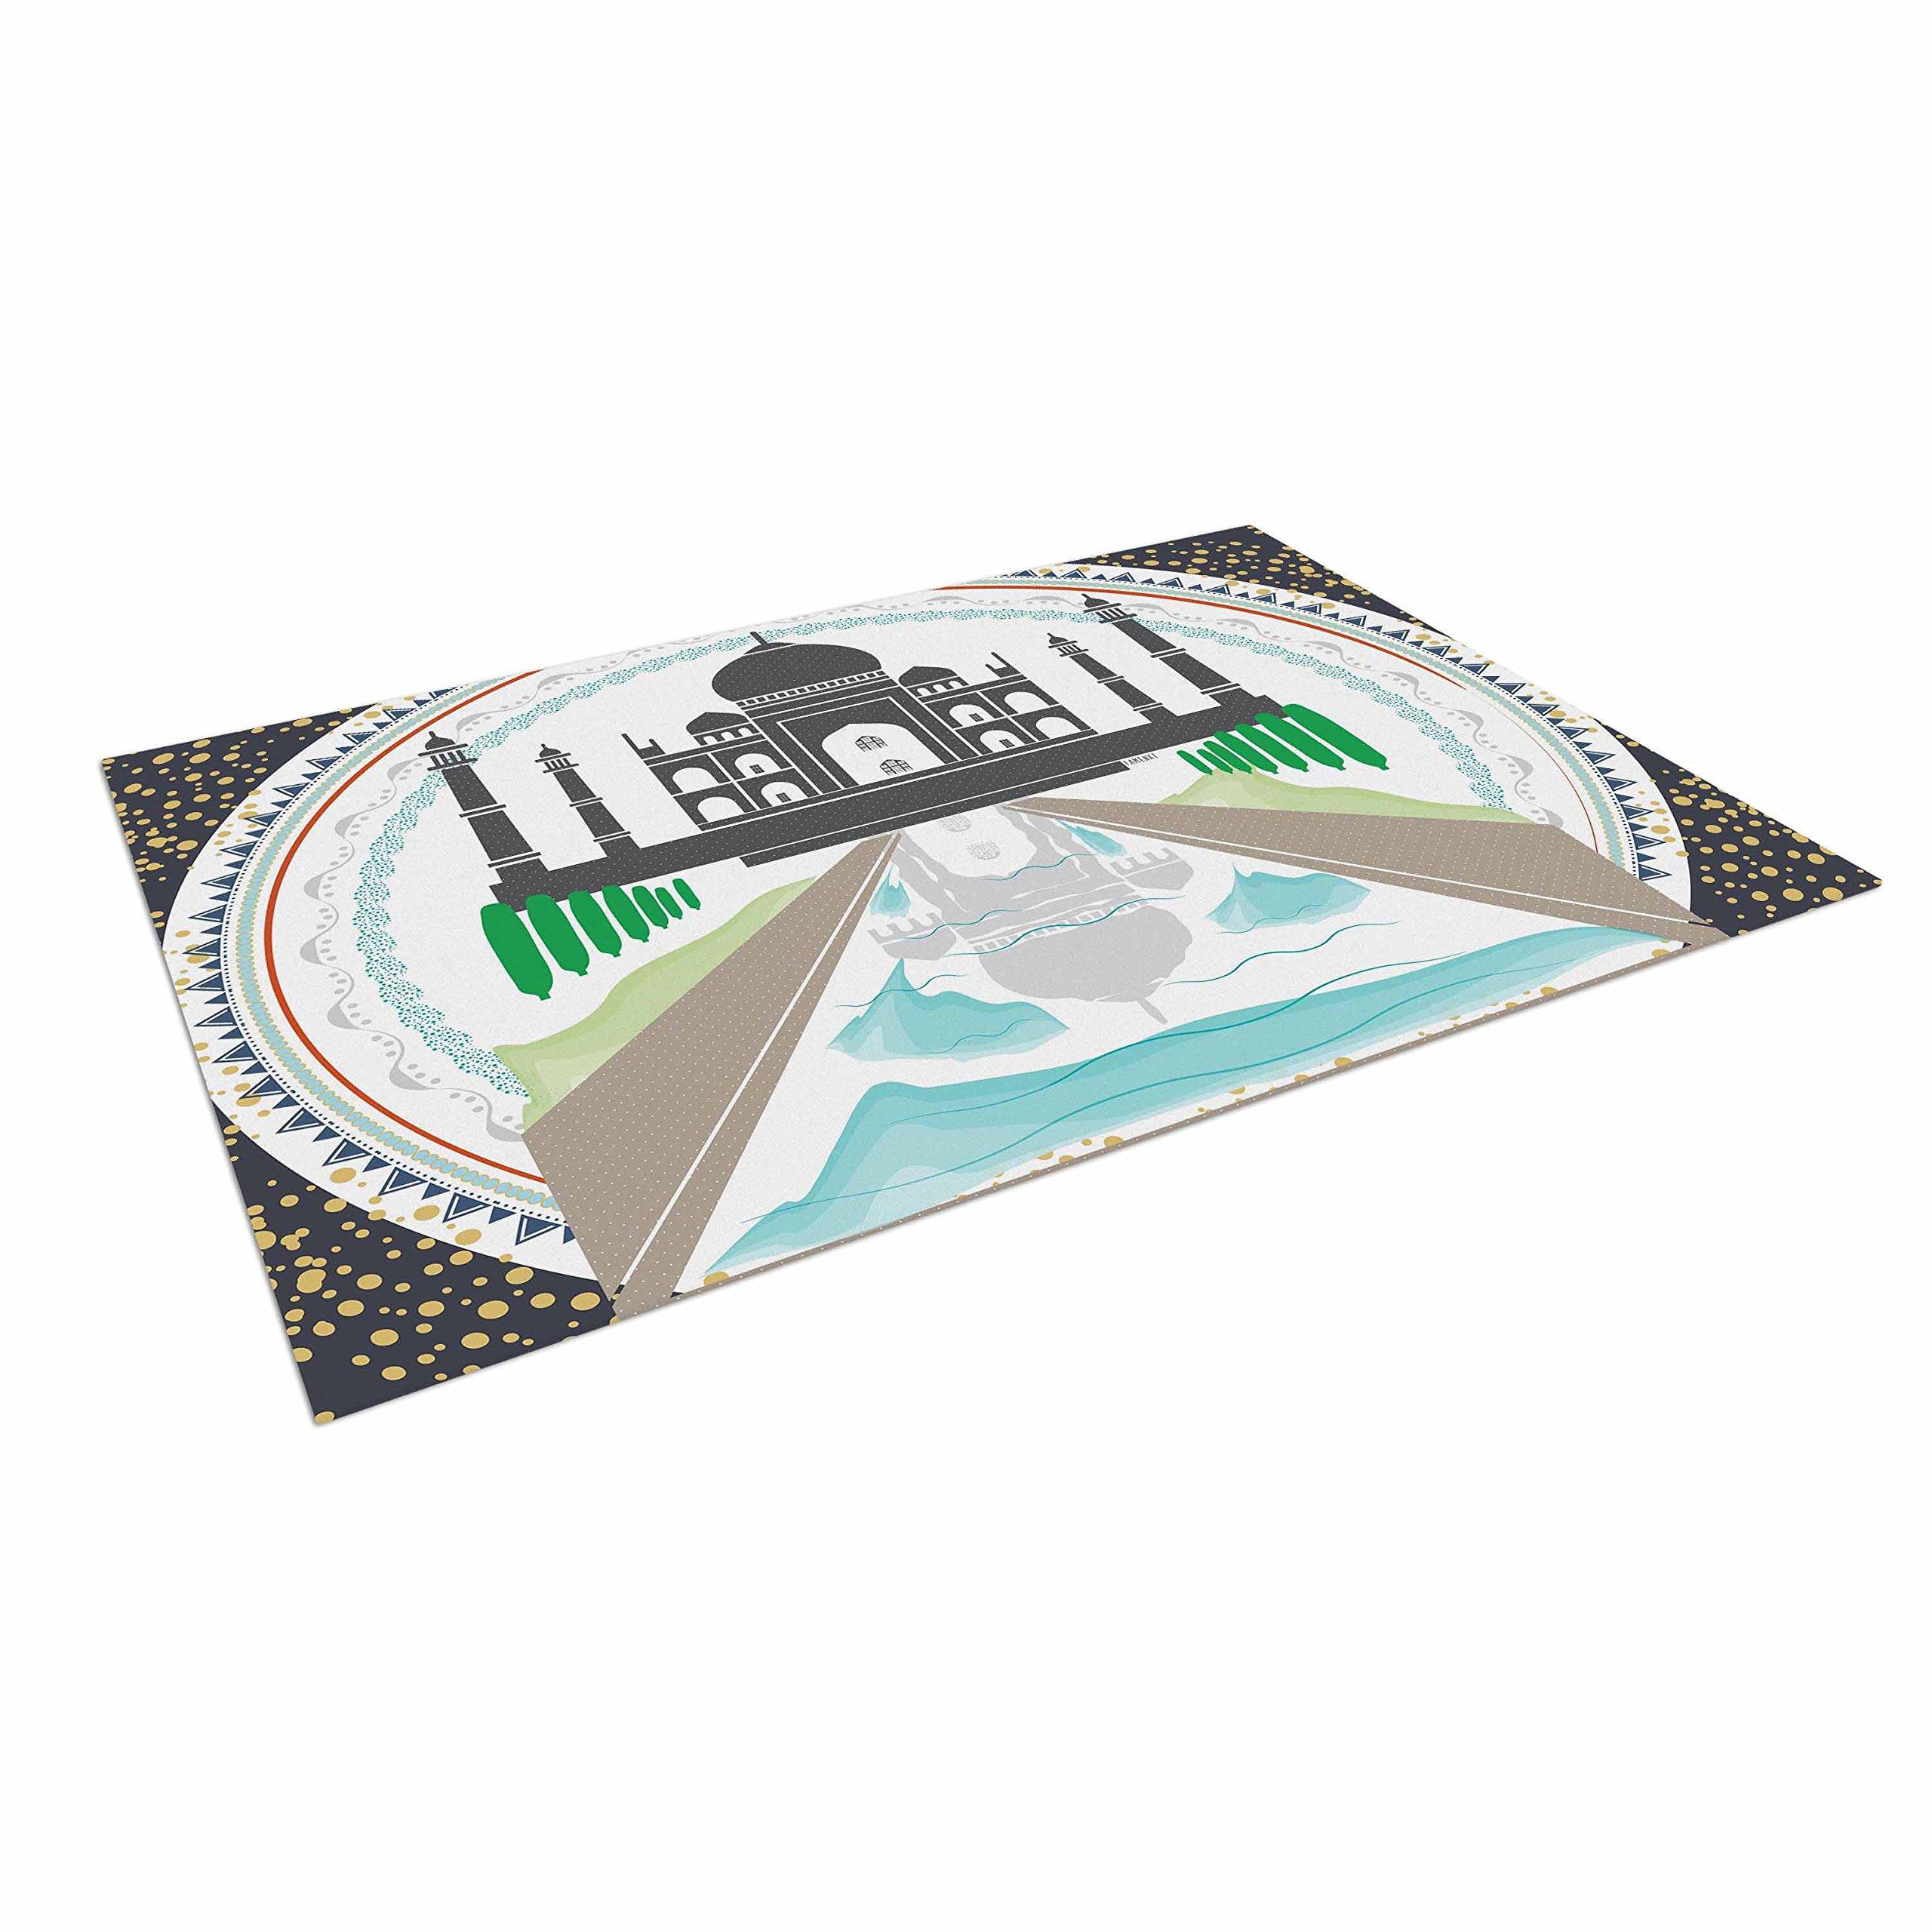 KESS InHouse Famenxt ''The Taj Mahal India'' Green Gray Indoor/Outdoor Floor Mat, 4' x 5'